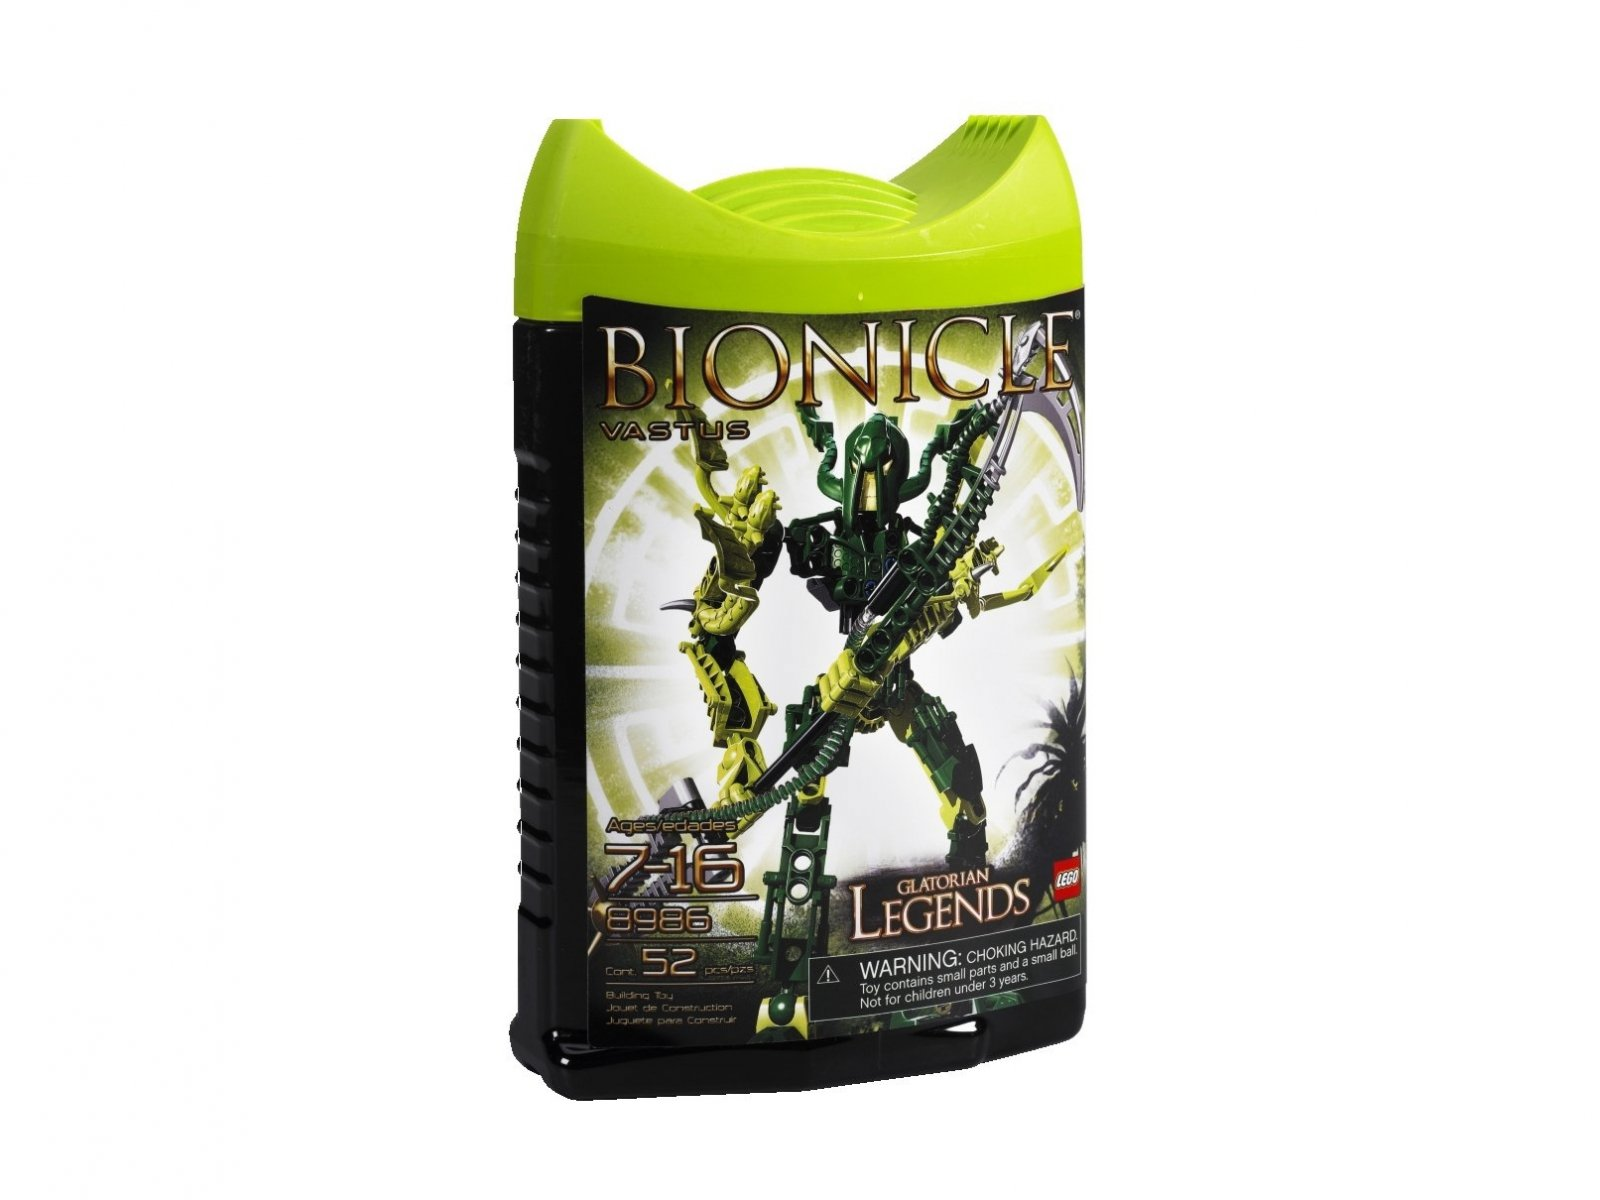 LEGO Bionicle® 8986 Vastus